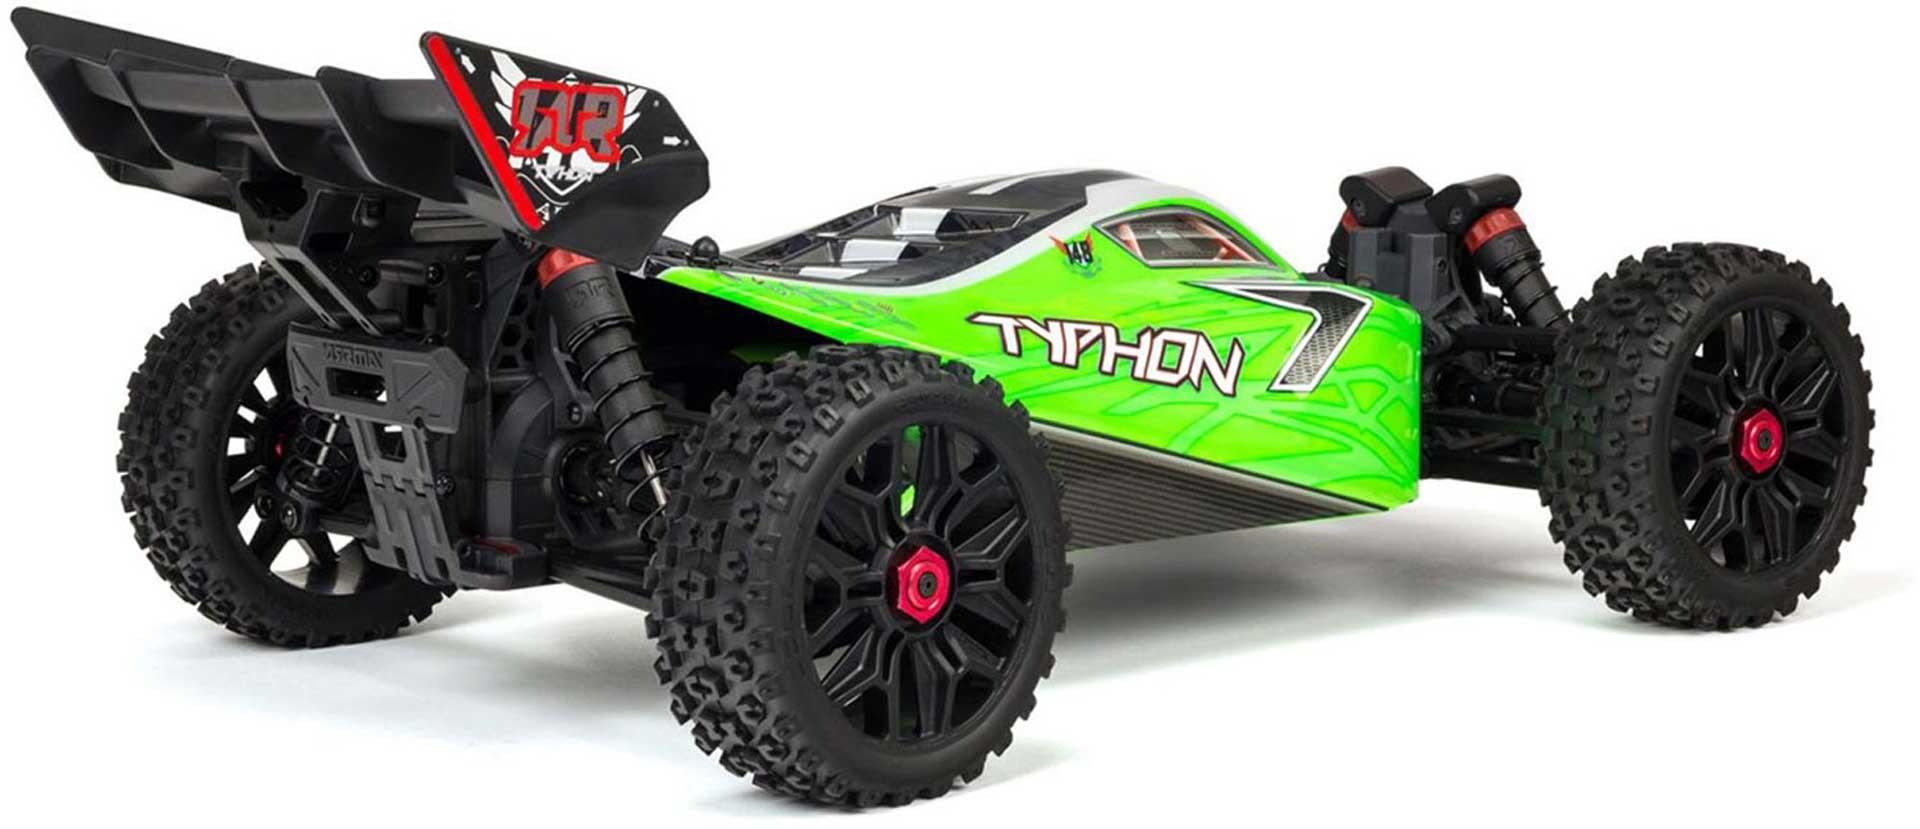 Arrma Typhon 4X4 550 Mega Brushed 1/8TH 4WD Buggy Green